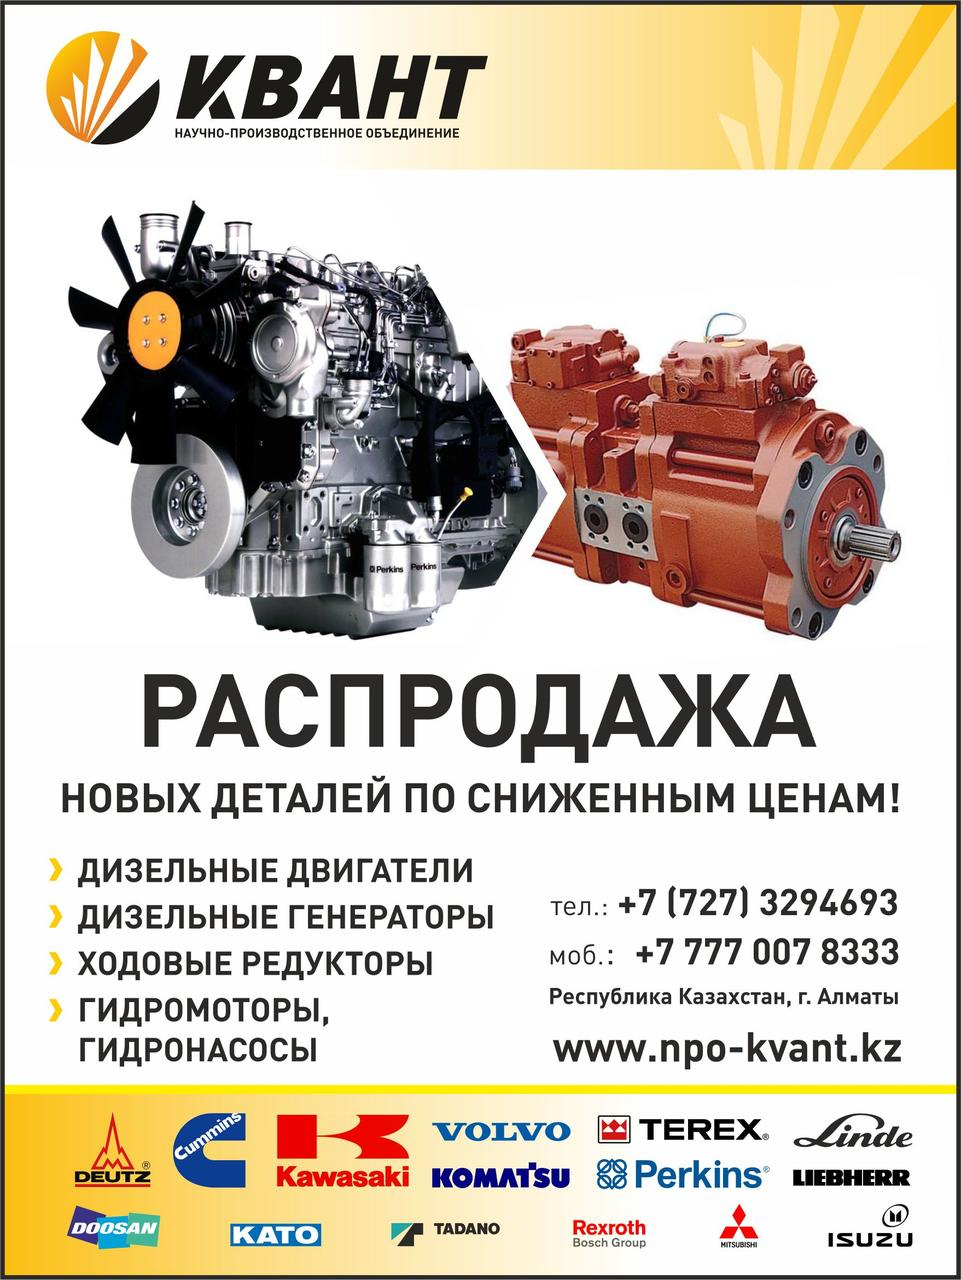 Двигатель MTU 20V 4000G63, MTU 20V 4000G63L, MTU 16V 2000 G26F, MTU 18V 2000 G26F